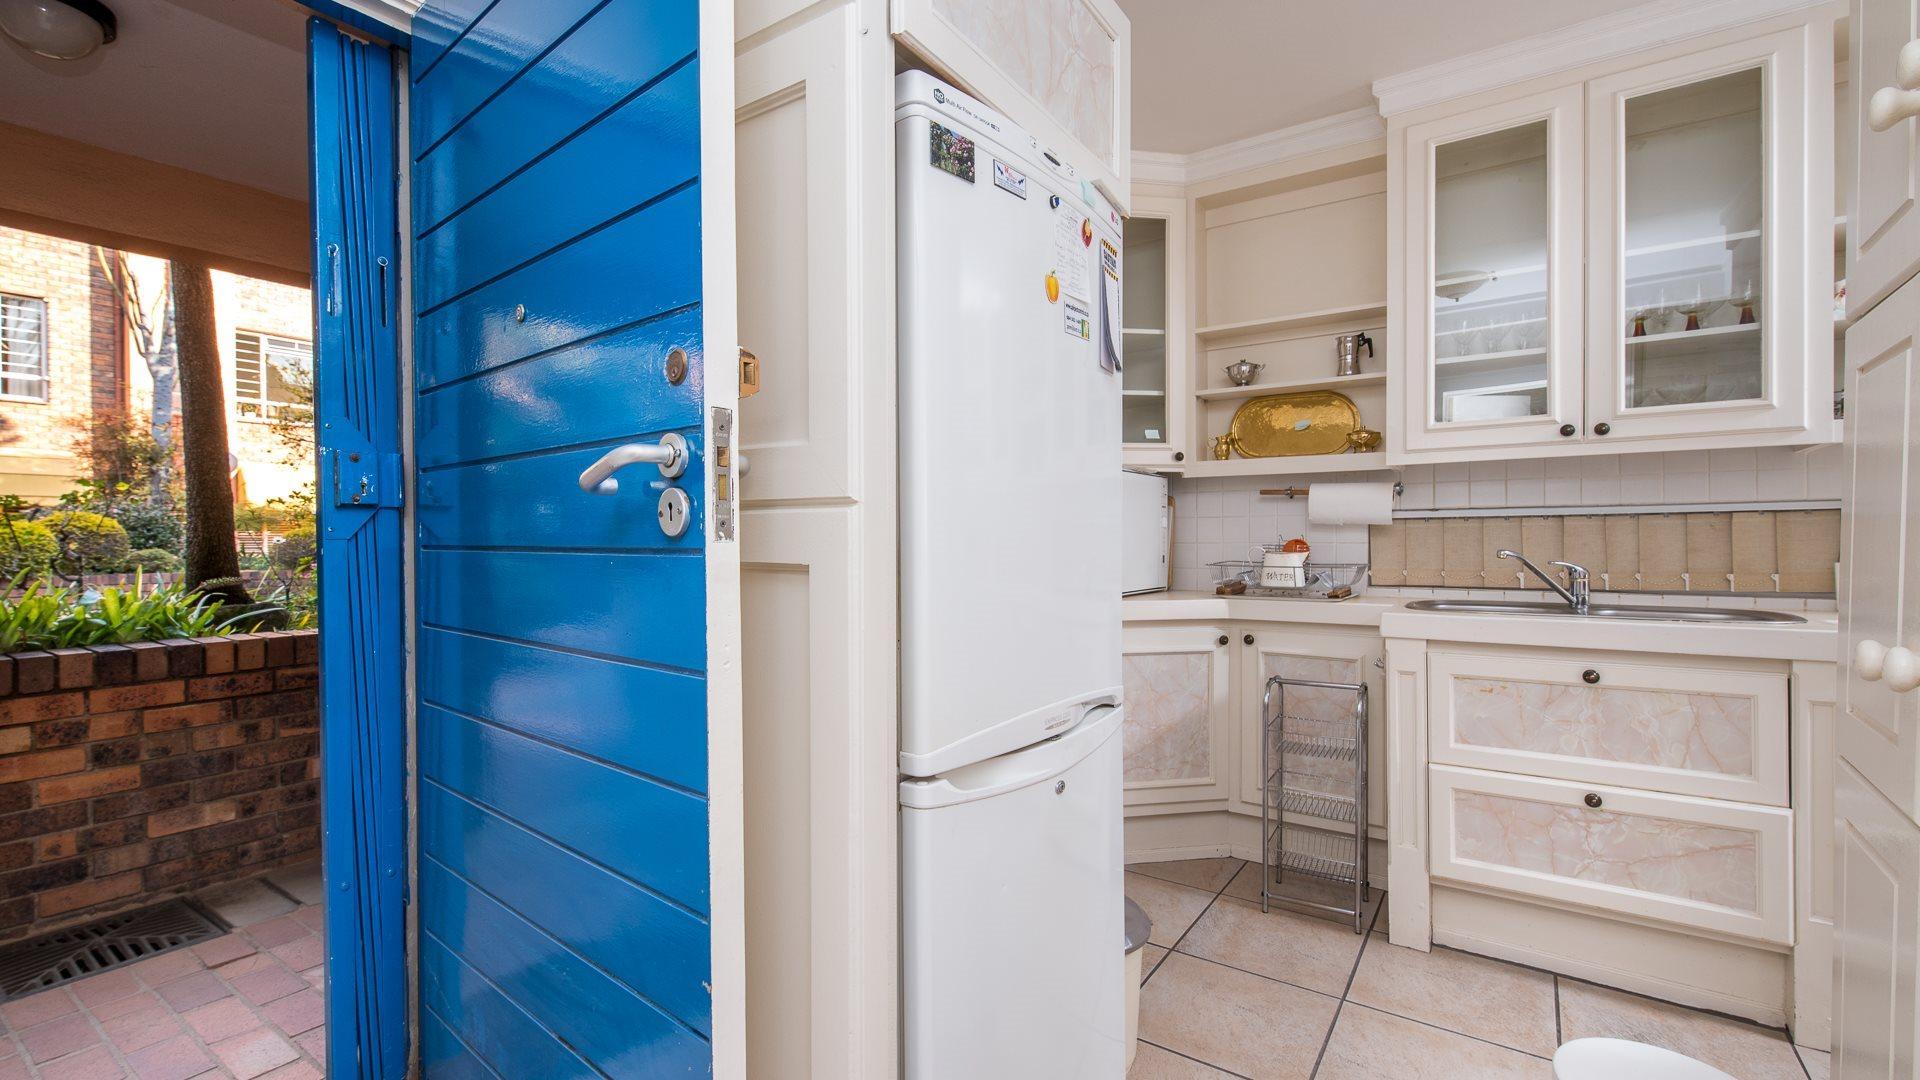 Johannesburg, Rosebank Property  | Houses For Sale Rosebank, Rosebank, Apartment 2 bedrooms property for sale Price:2,600,000